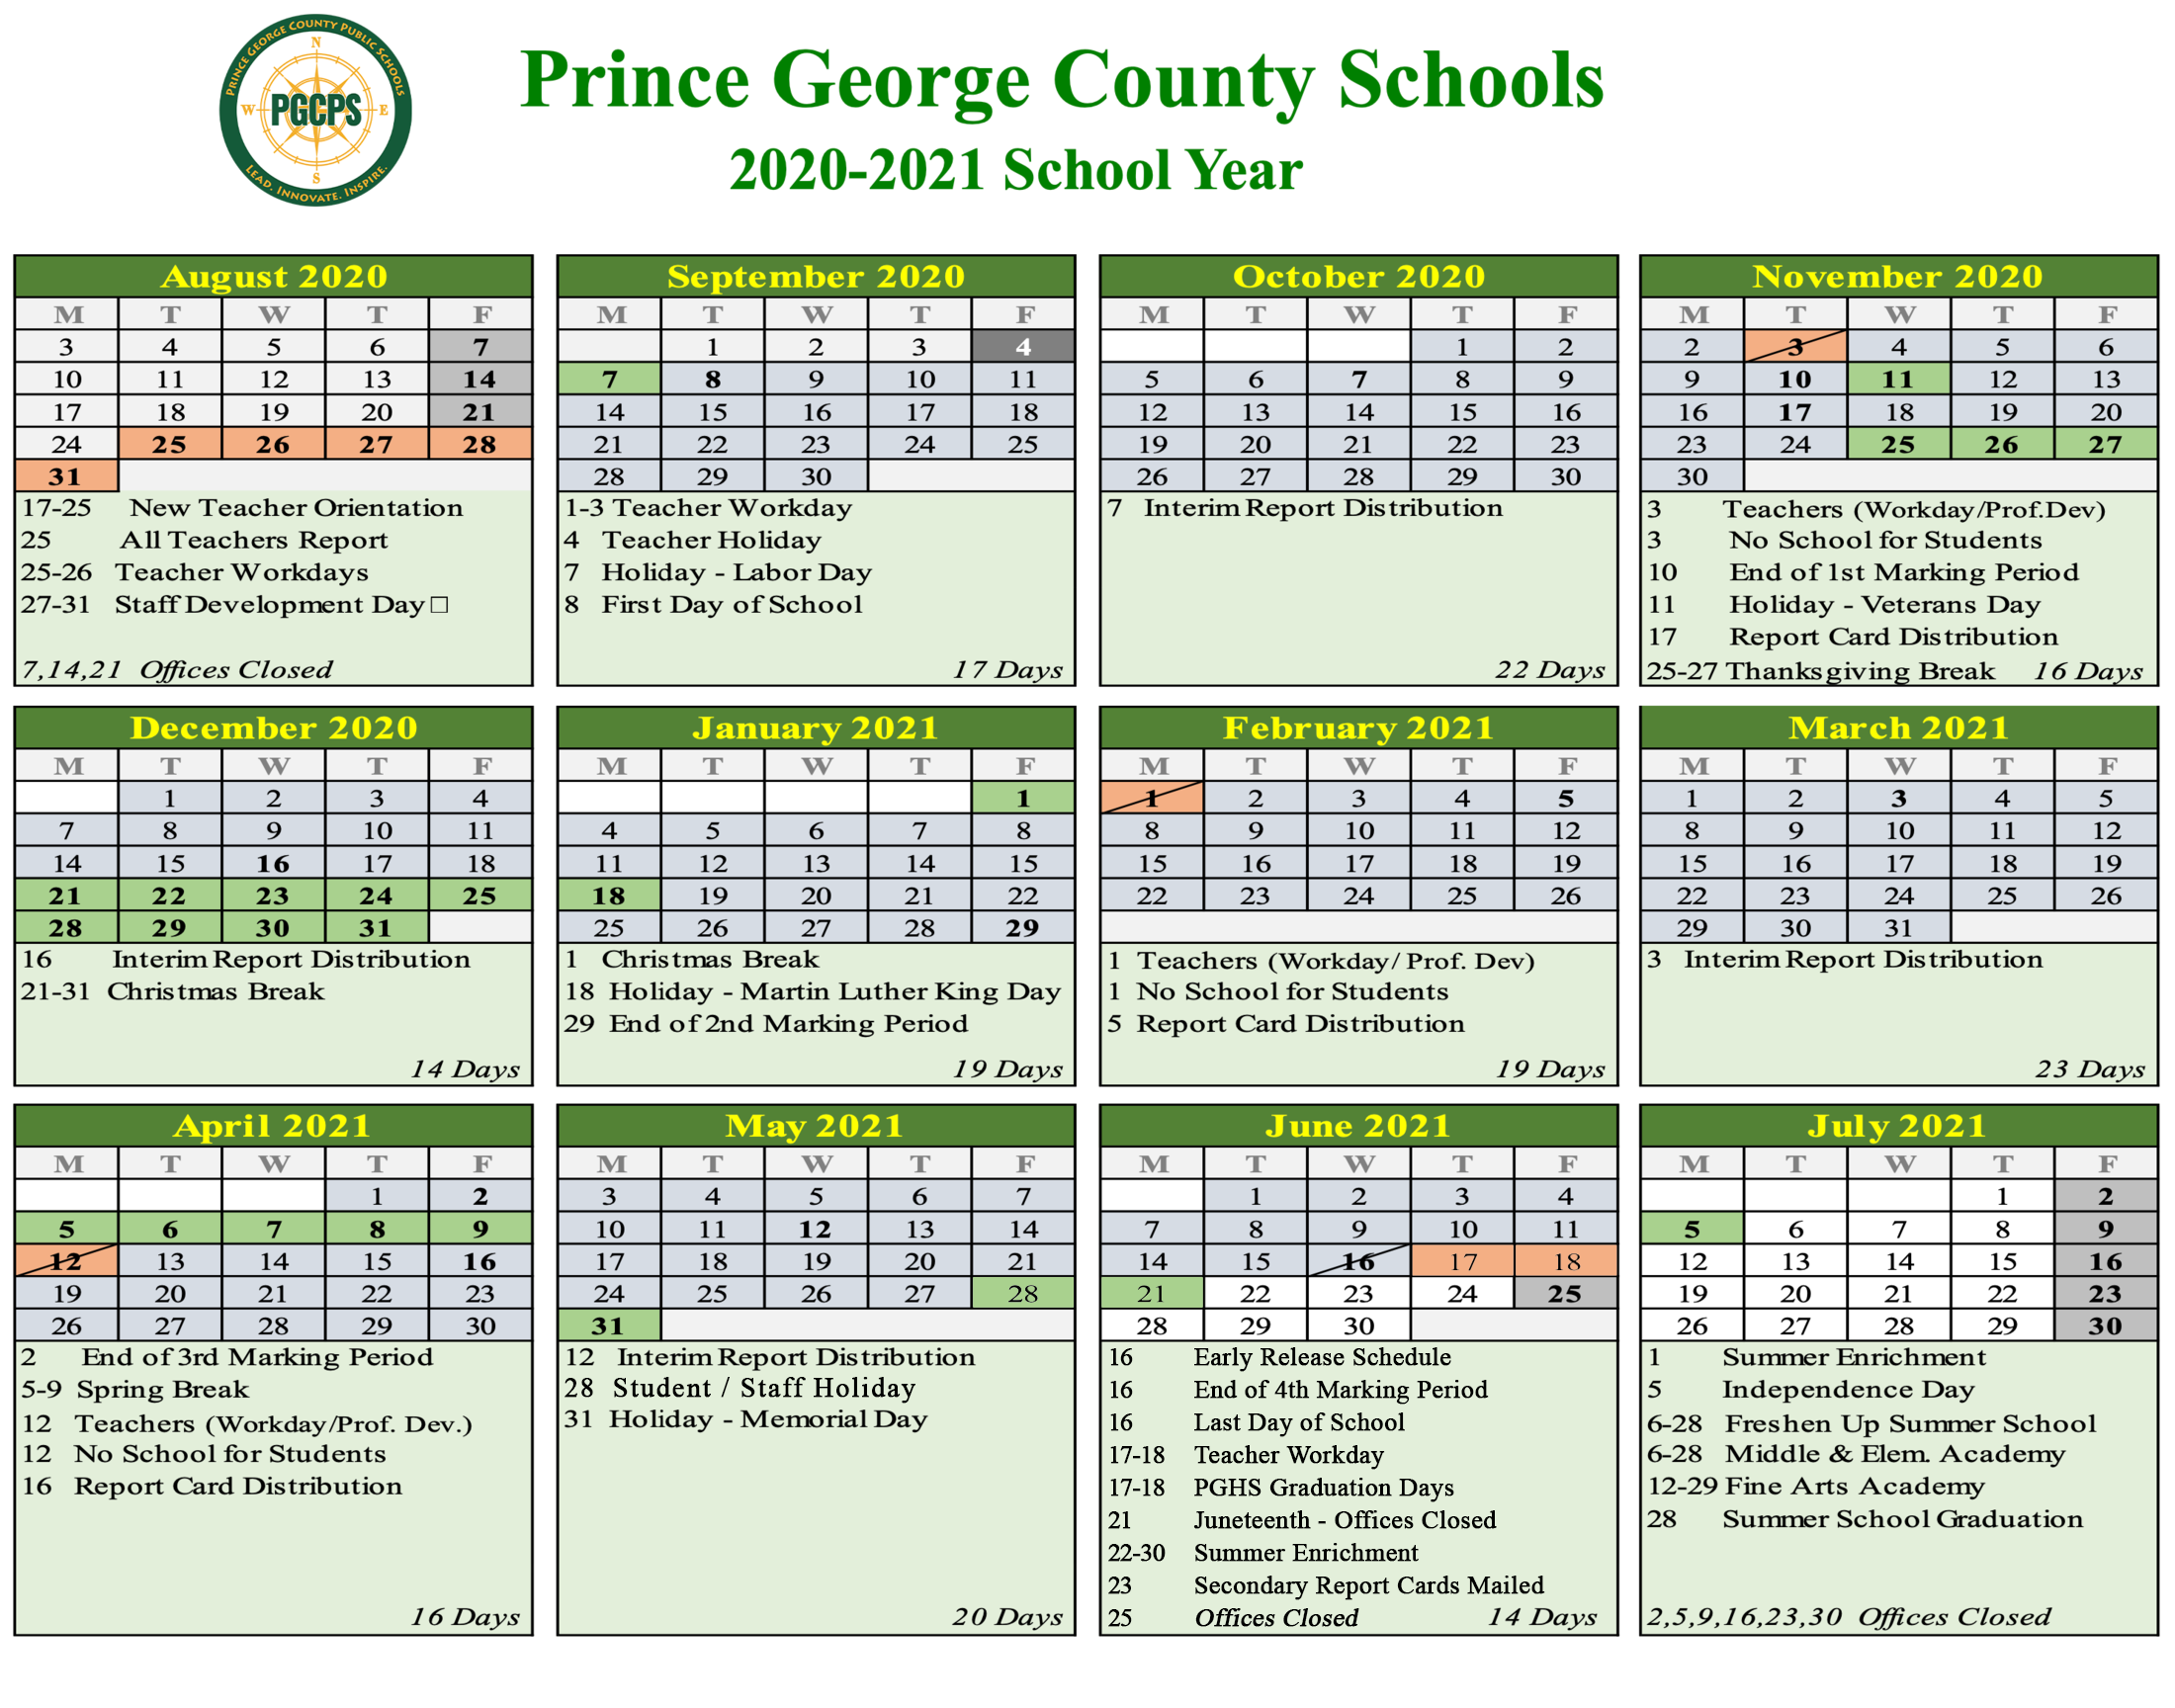 Pgcps Calendar 2022.2020 21 School Year Calendar About Us Prince George County Public Schools